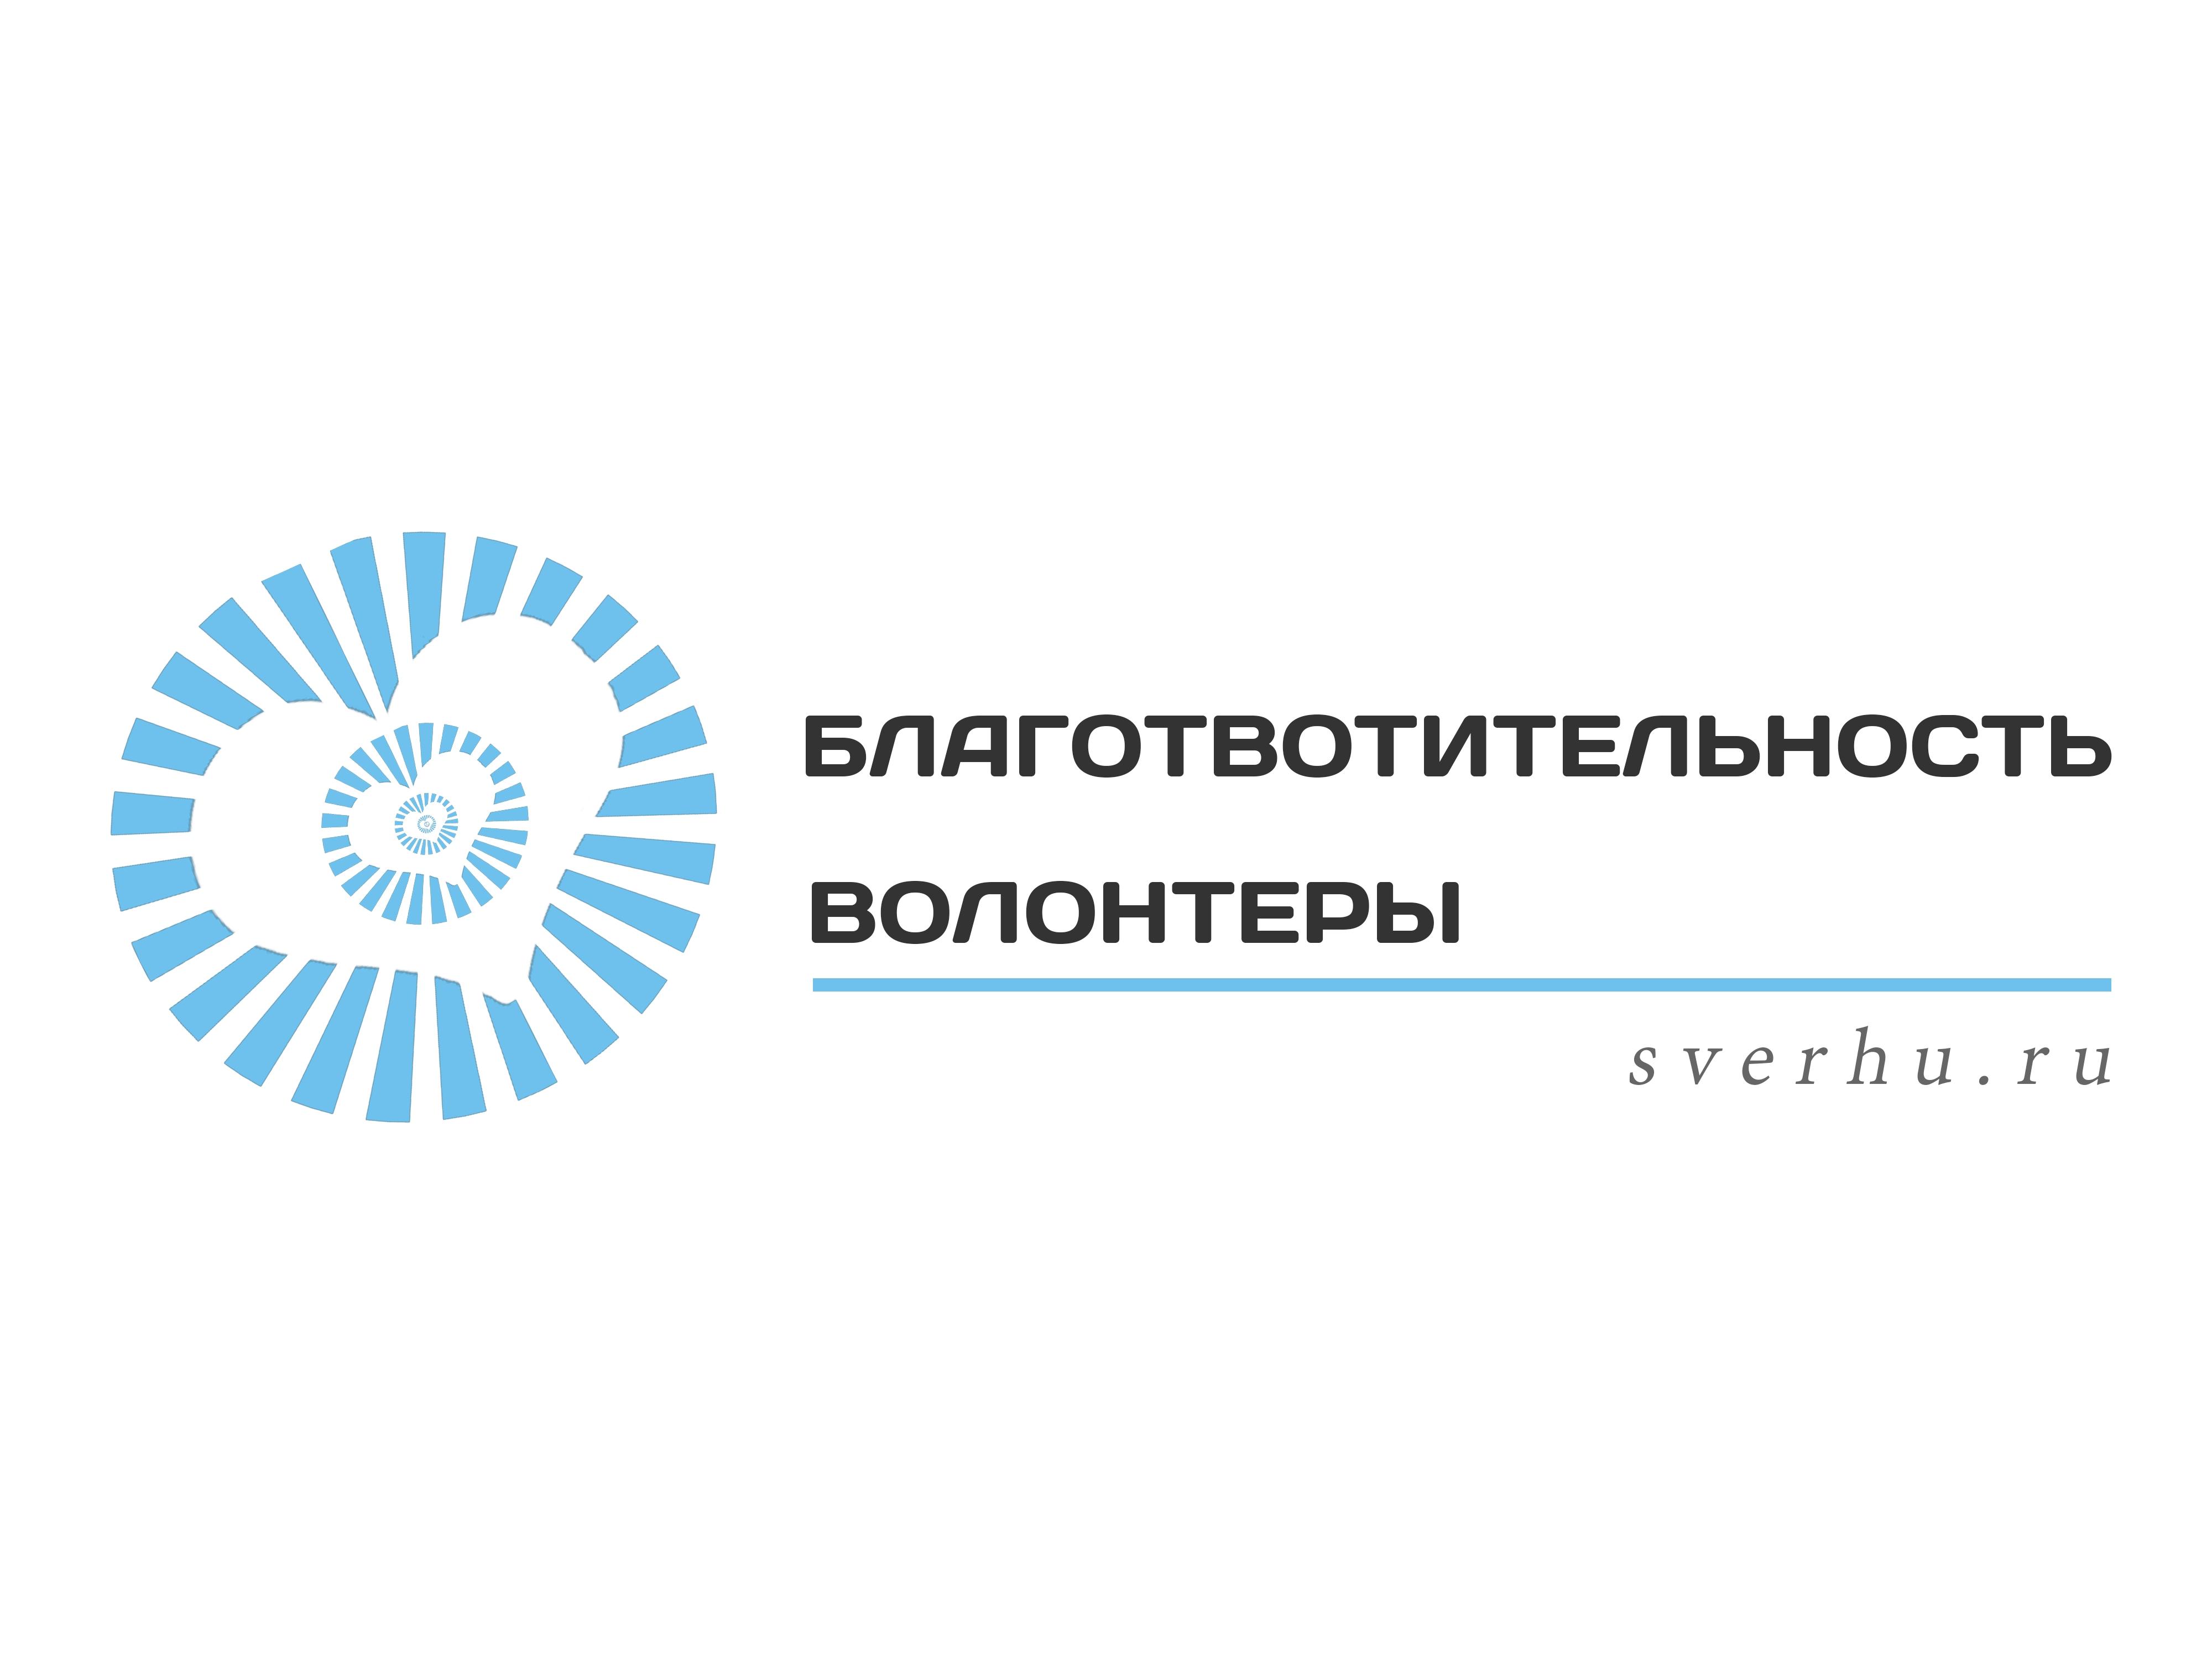 логотип  фото f_20555c62a5533bd4.jpg